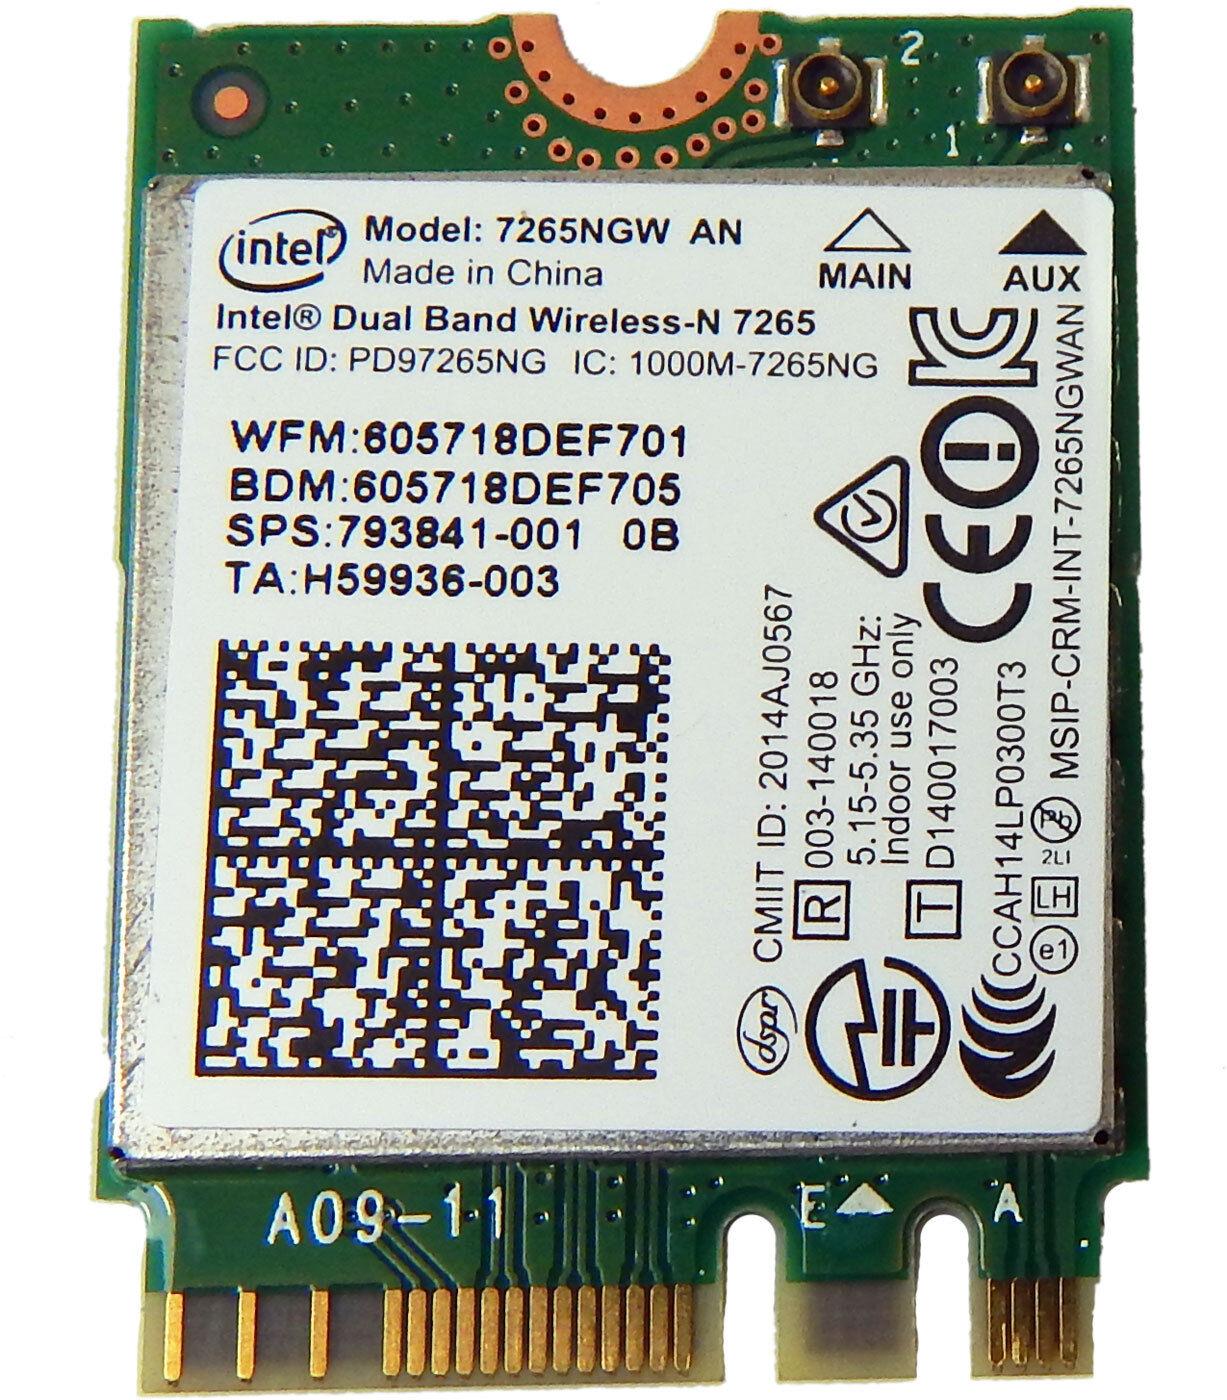 Intel 7265NGW AN WLAN M.2 2x2 WiFi BT4 Mod 793841-001 802.11ac wifi + Bluetooth